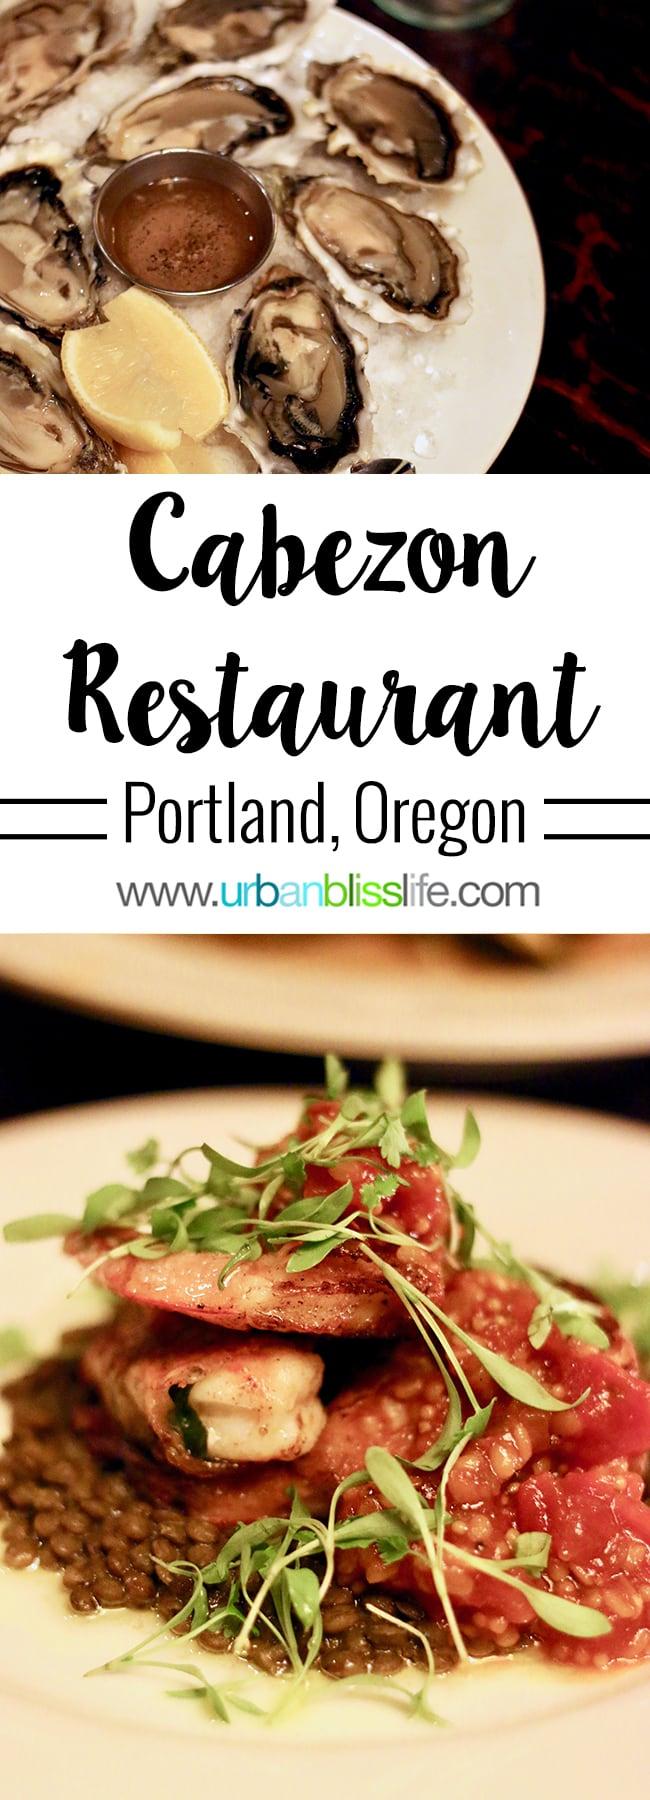 Cabezon restaurant in Portland, Oregon. Full restaurant details on UrbanBlissLife.com